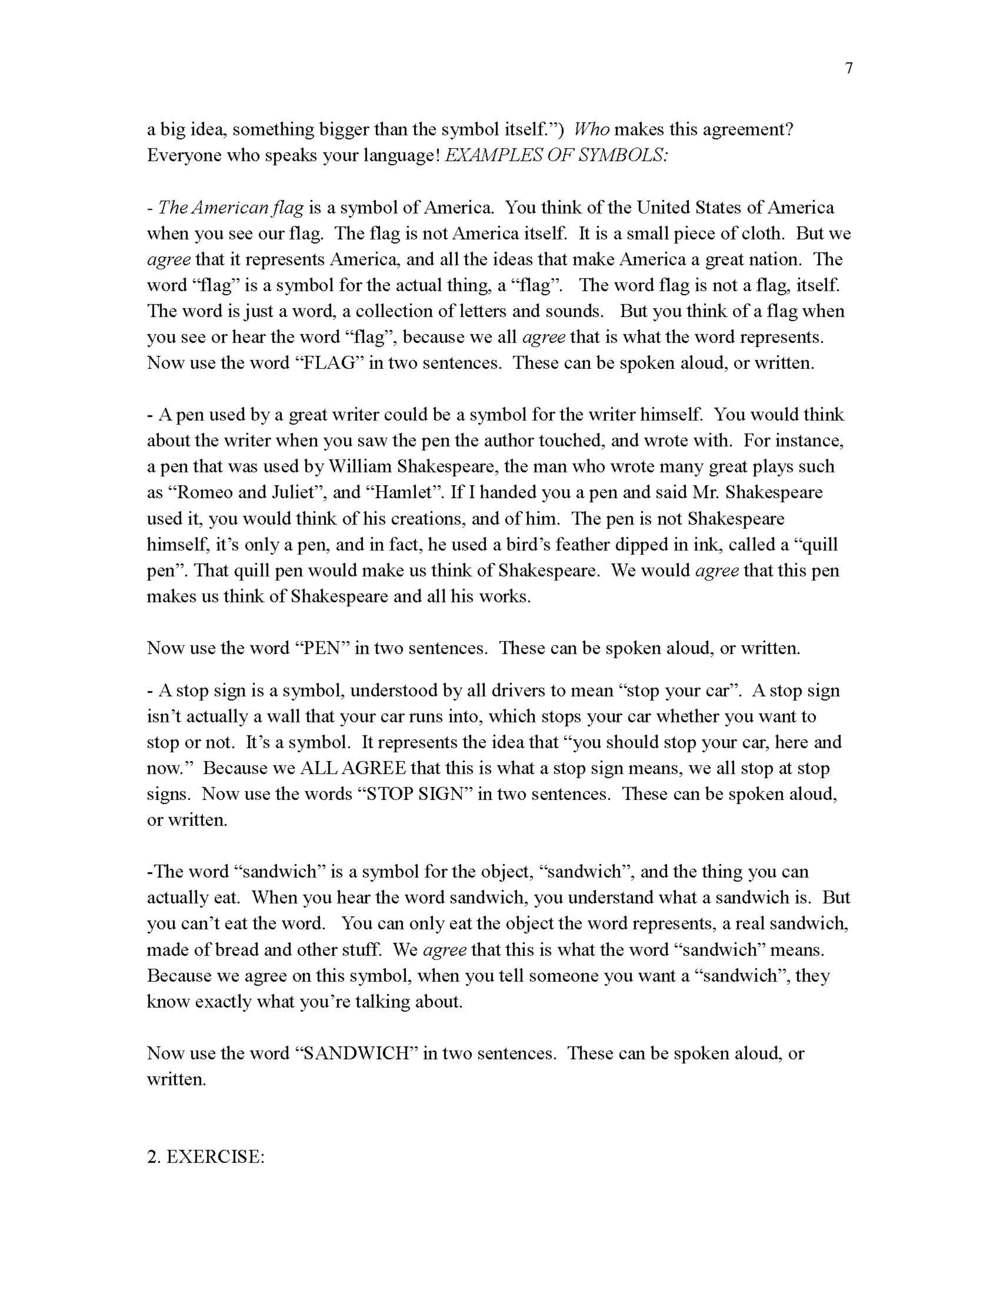 Samples Step 3-4 Creative Writing 1_Page_08.jpg